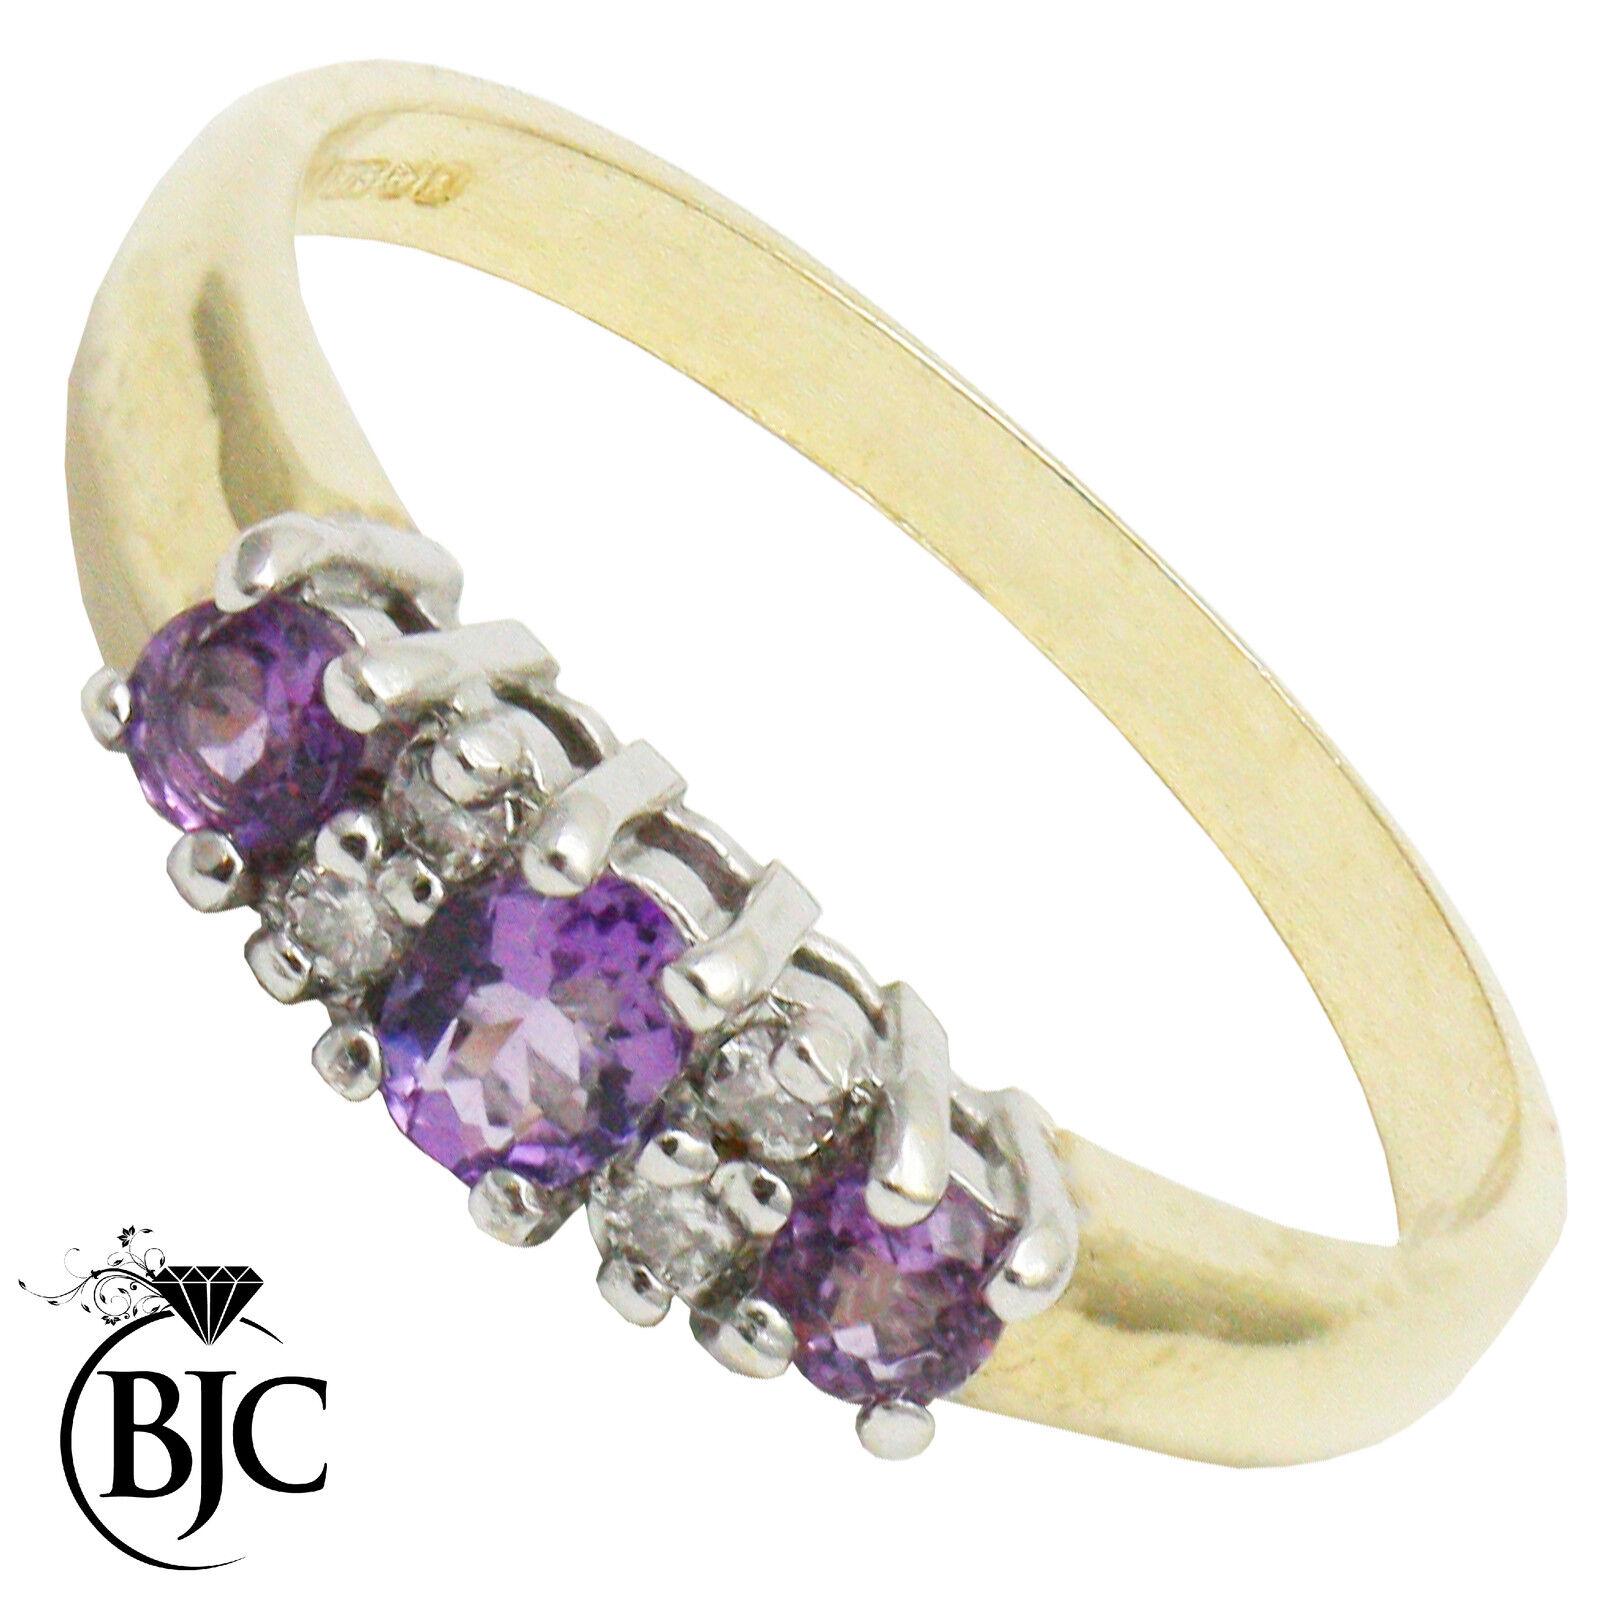 BJC 9 Karat yellowgold amethyst & Diamant halbe ewigkeit Verlobungsring R259